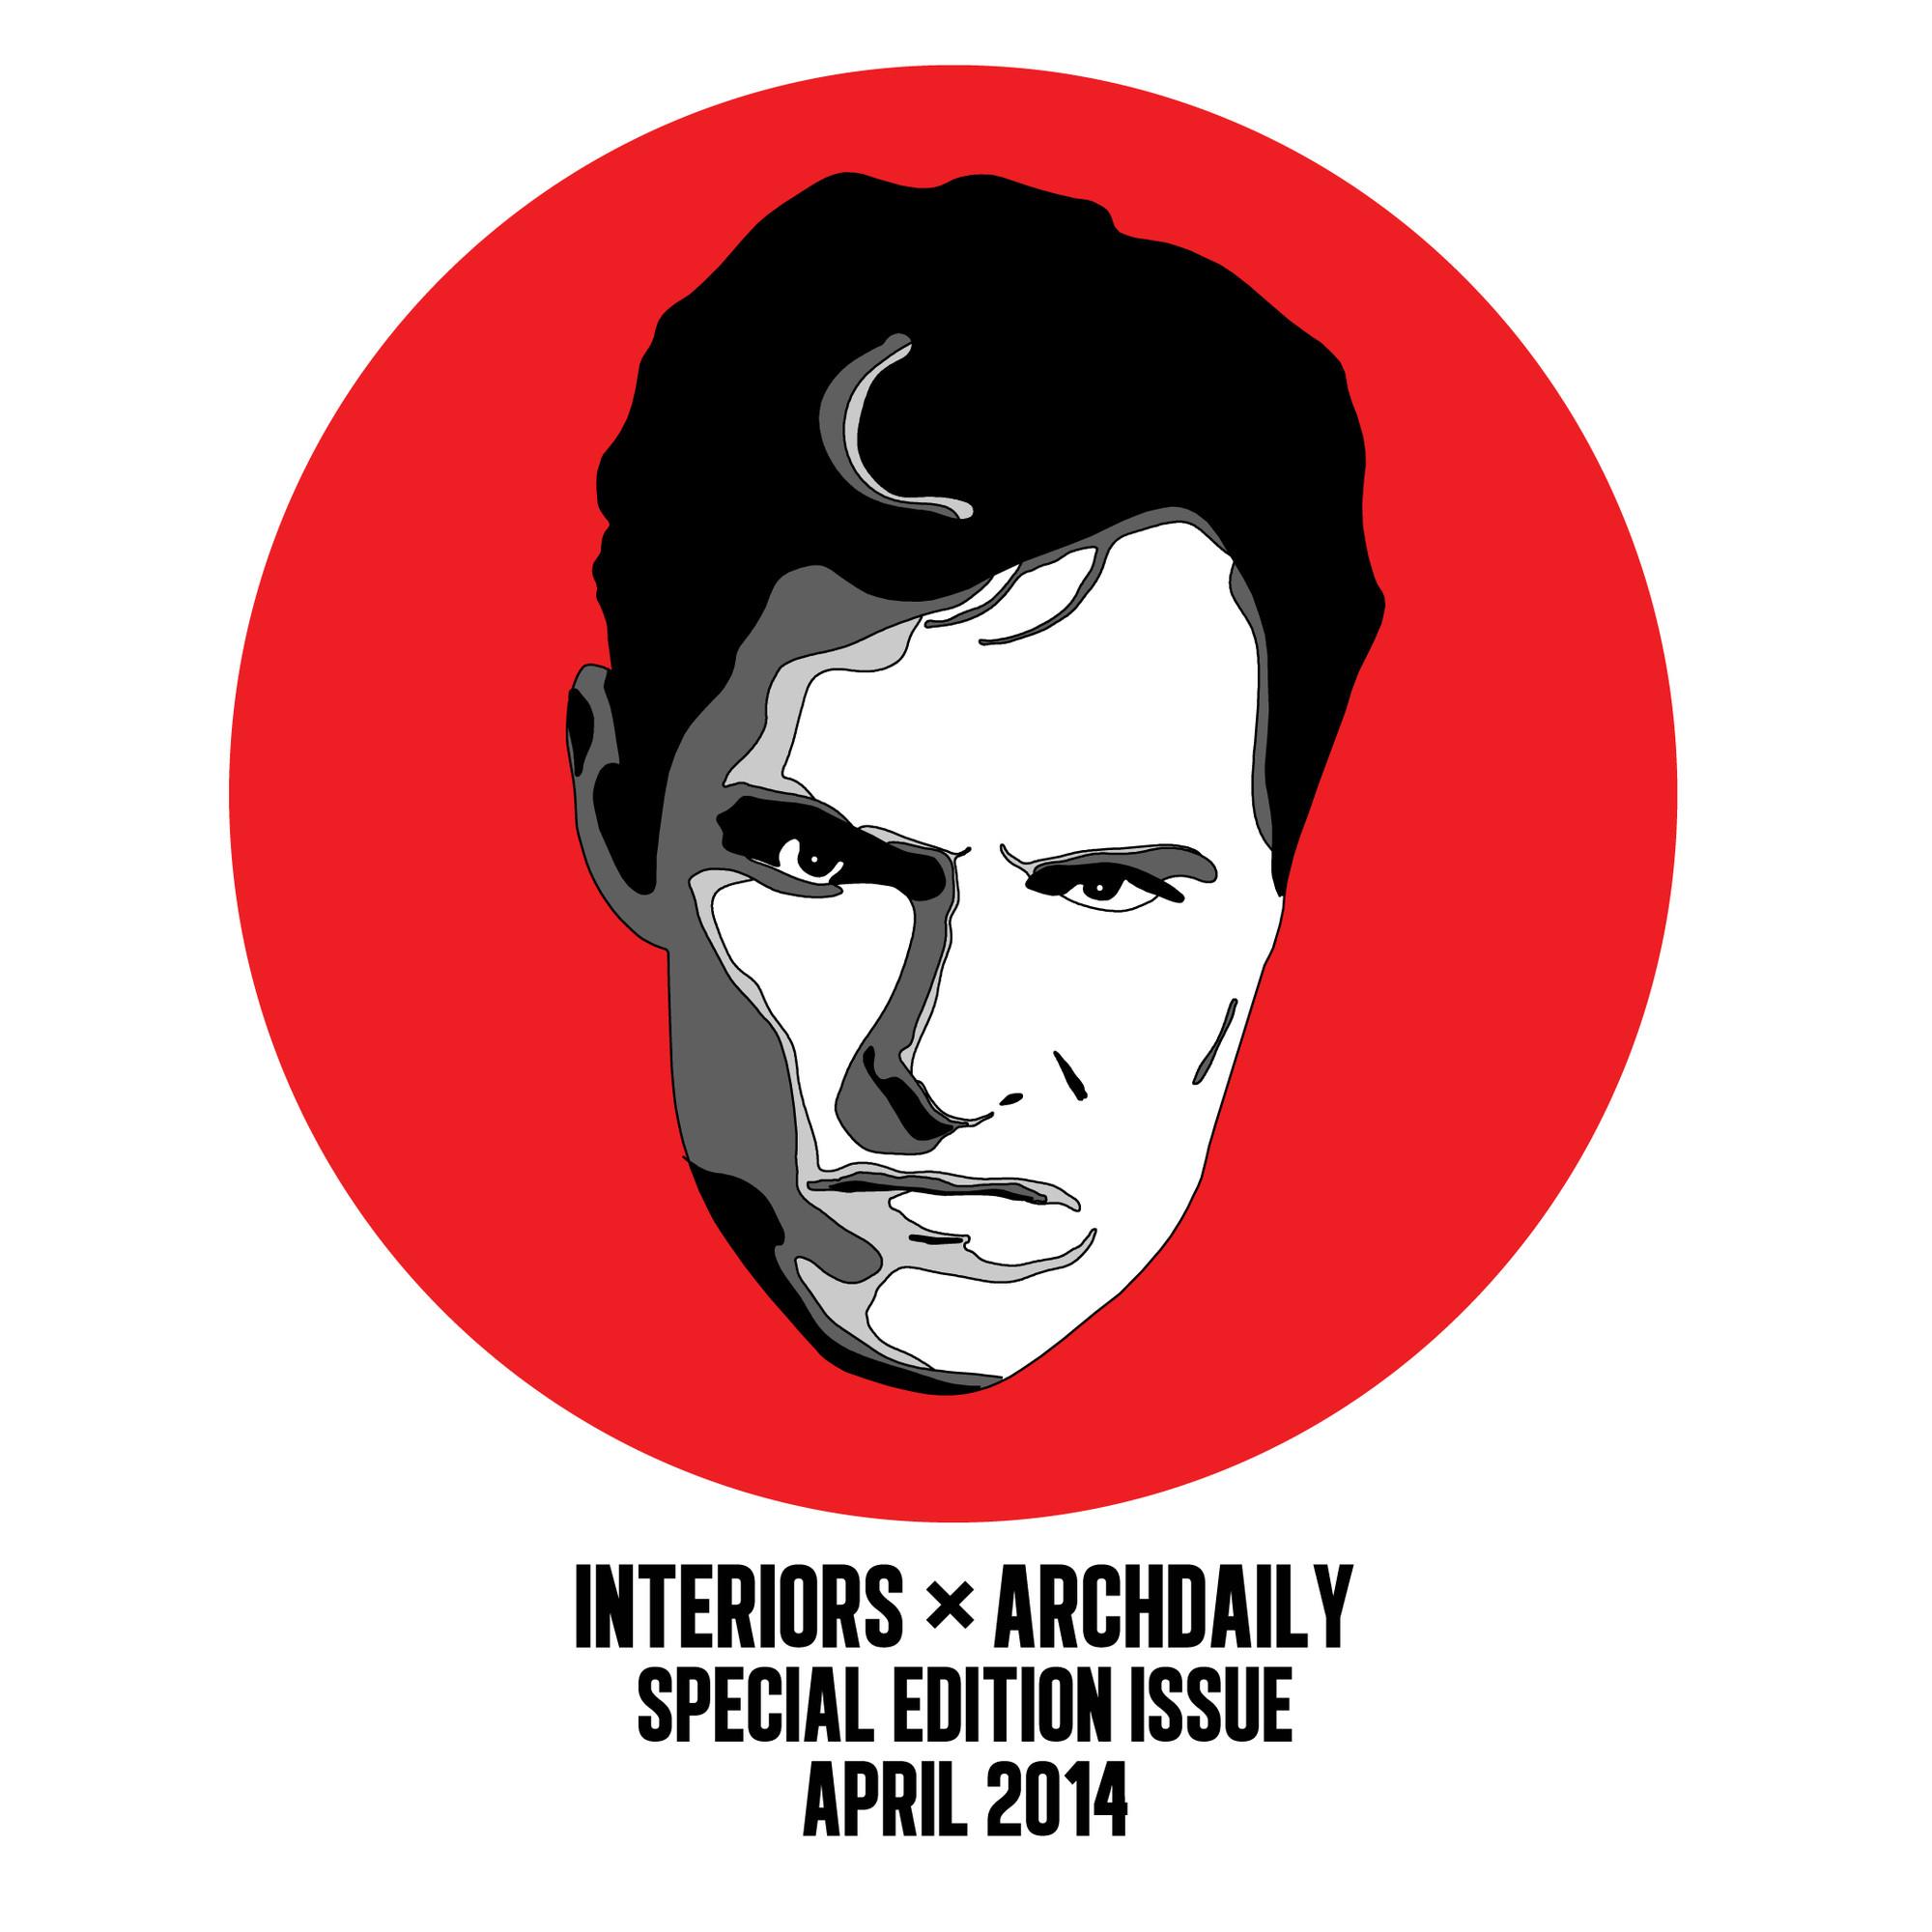 INTERIORS: True Detective, Courtesy of INTERIORS Journal